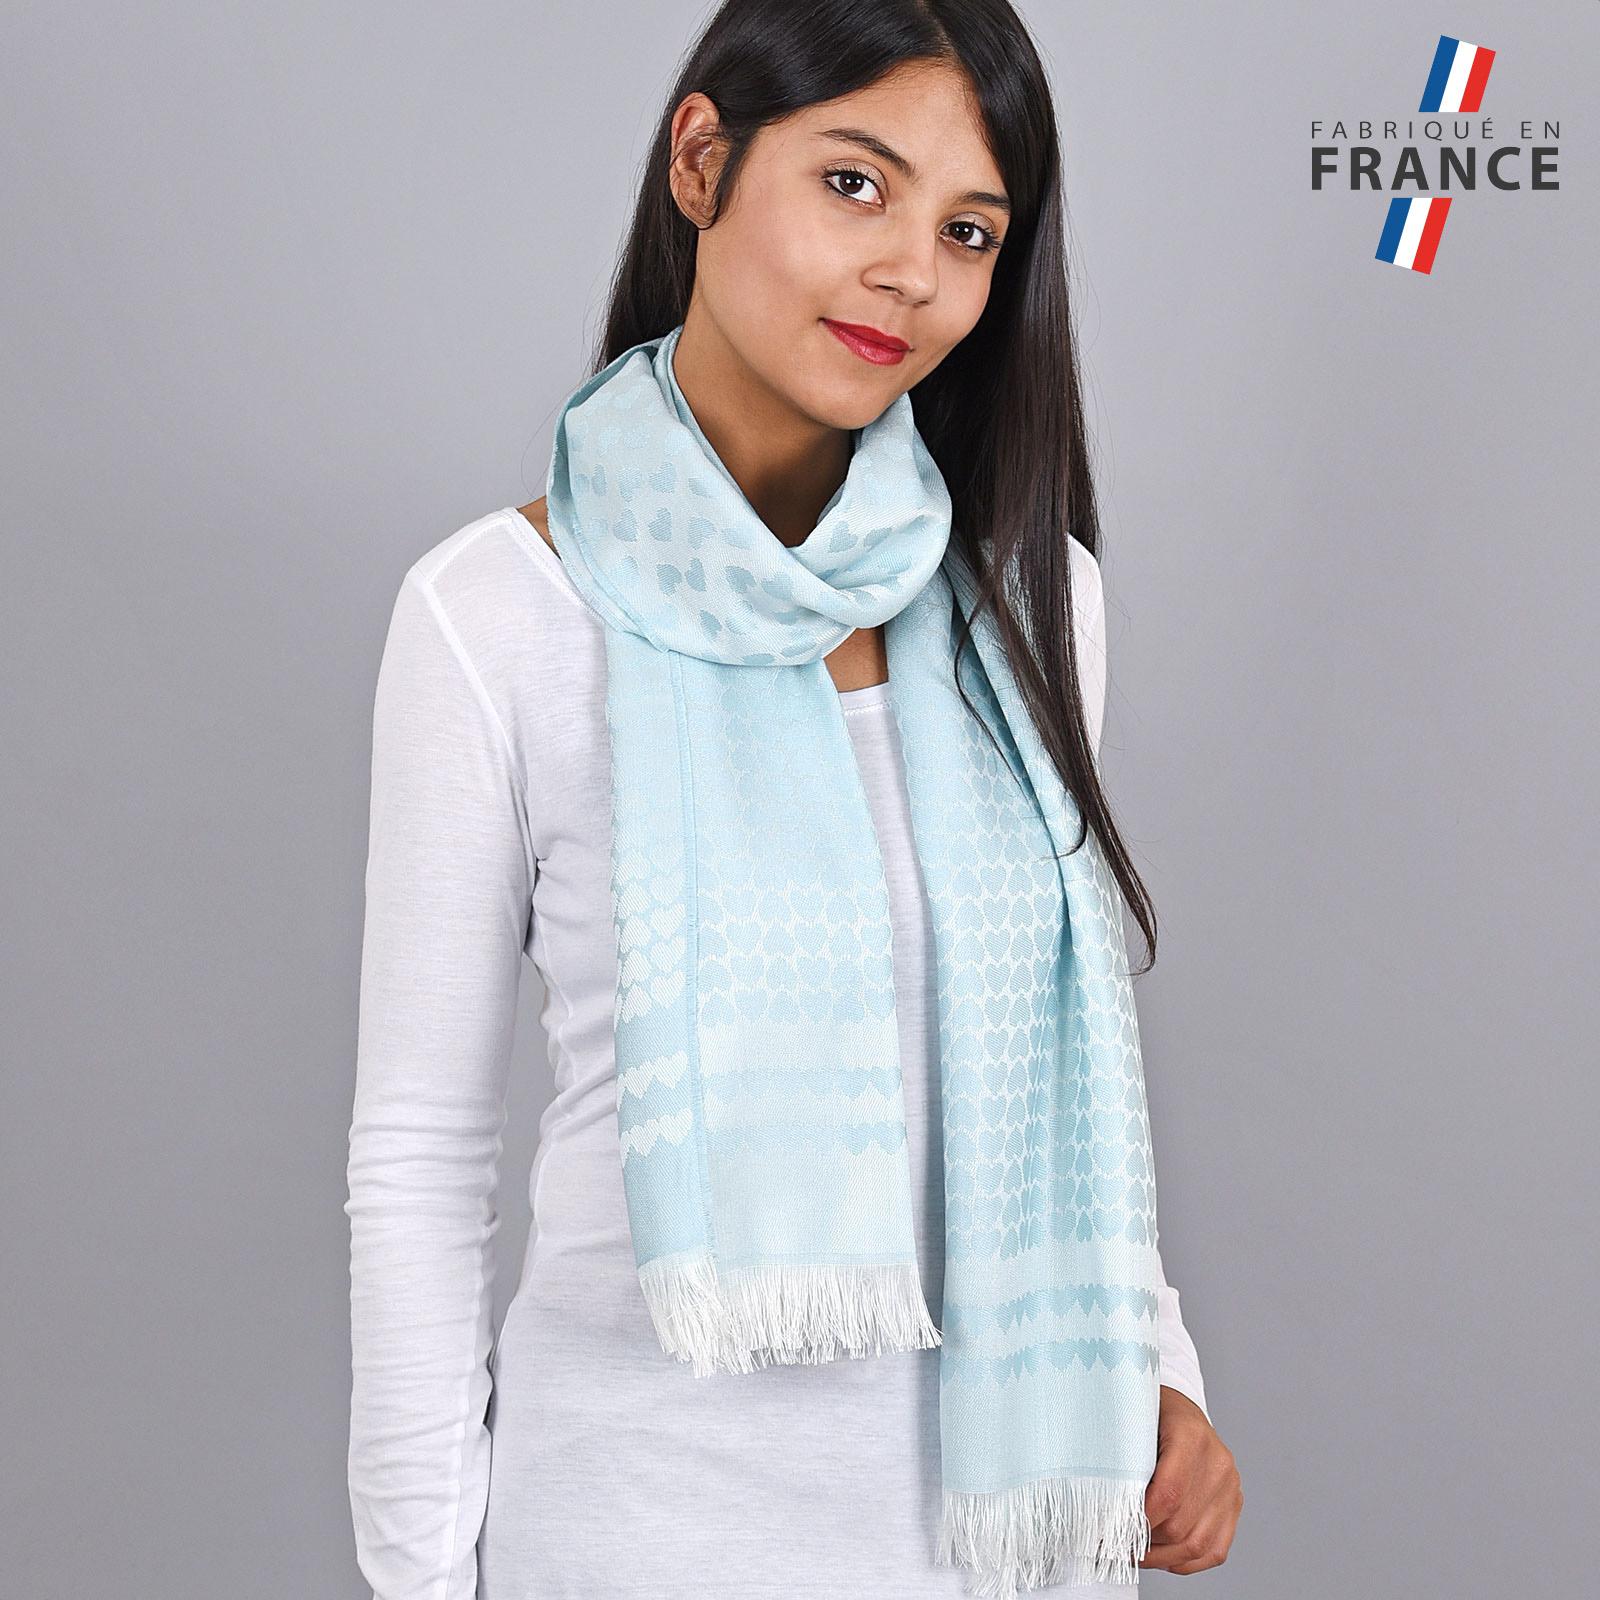 AT-04272-VF16-LB_FR-echarpe-femme-bleue-turquoise-coeurs